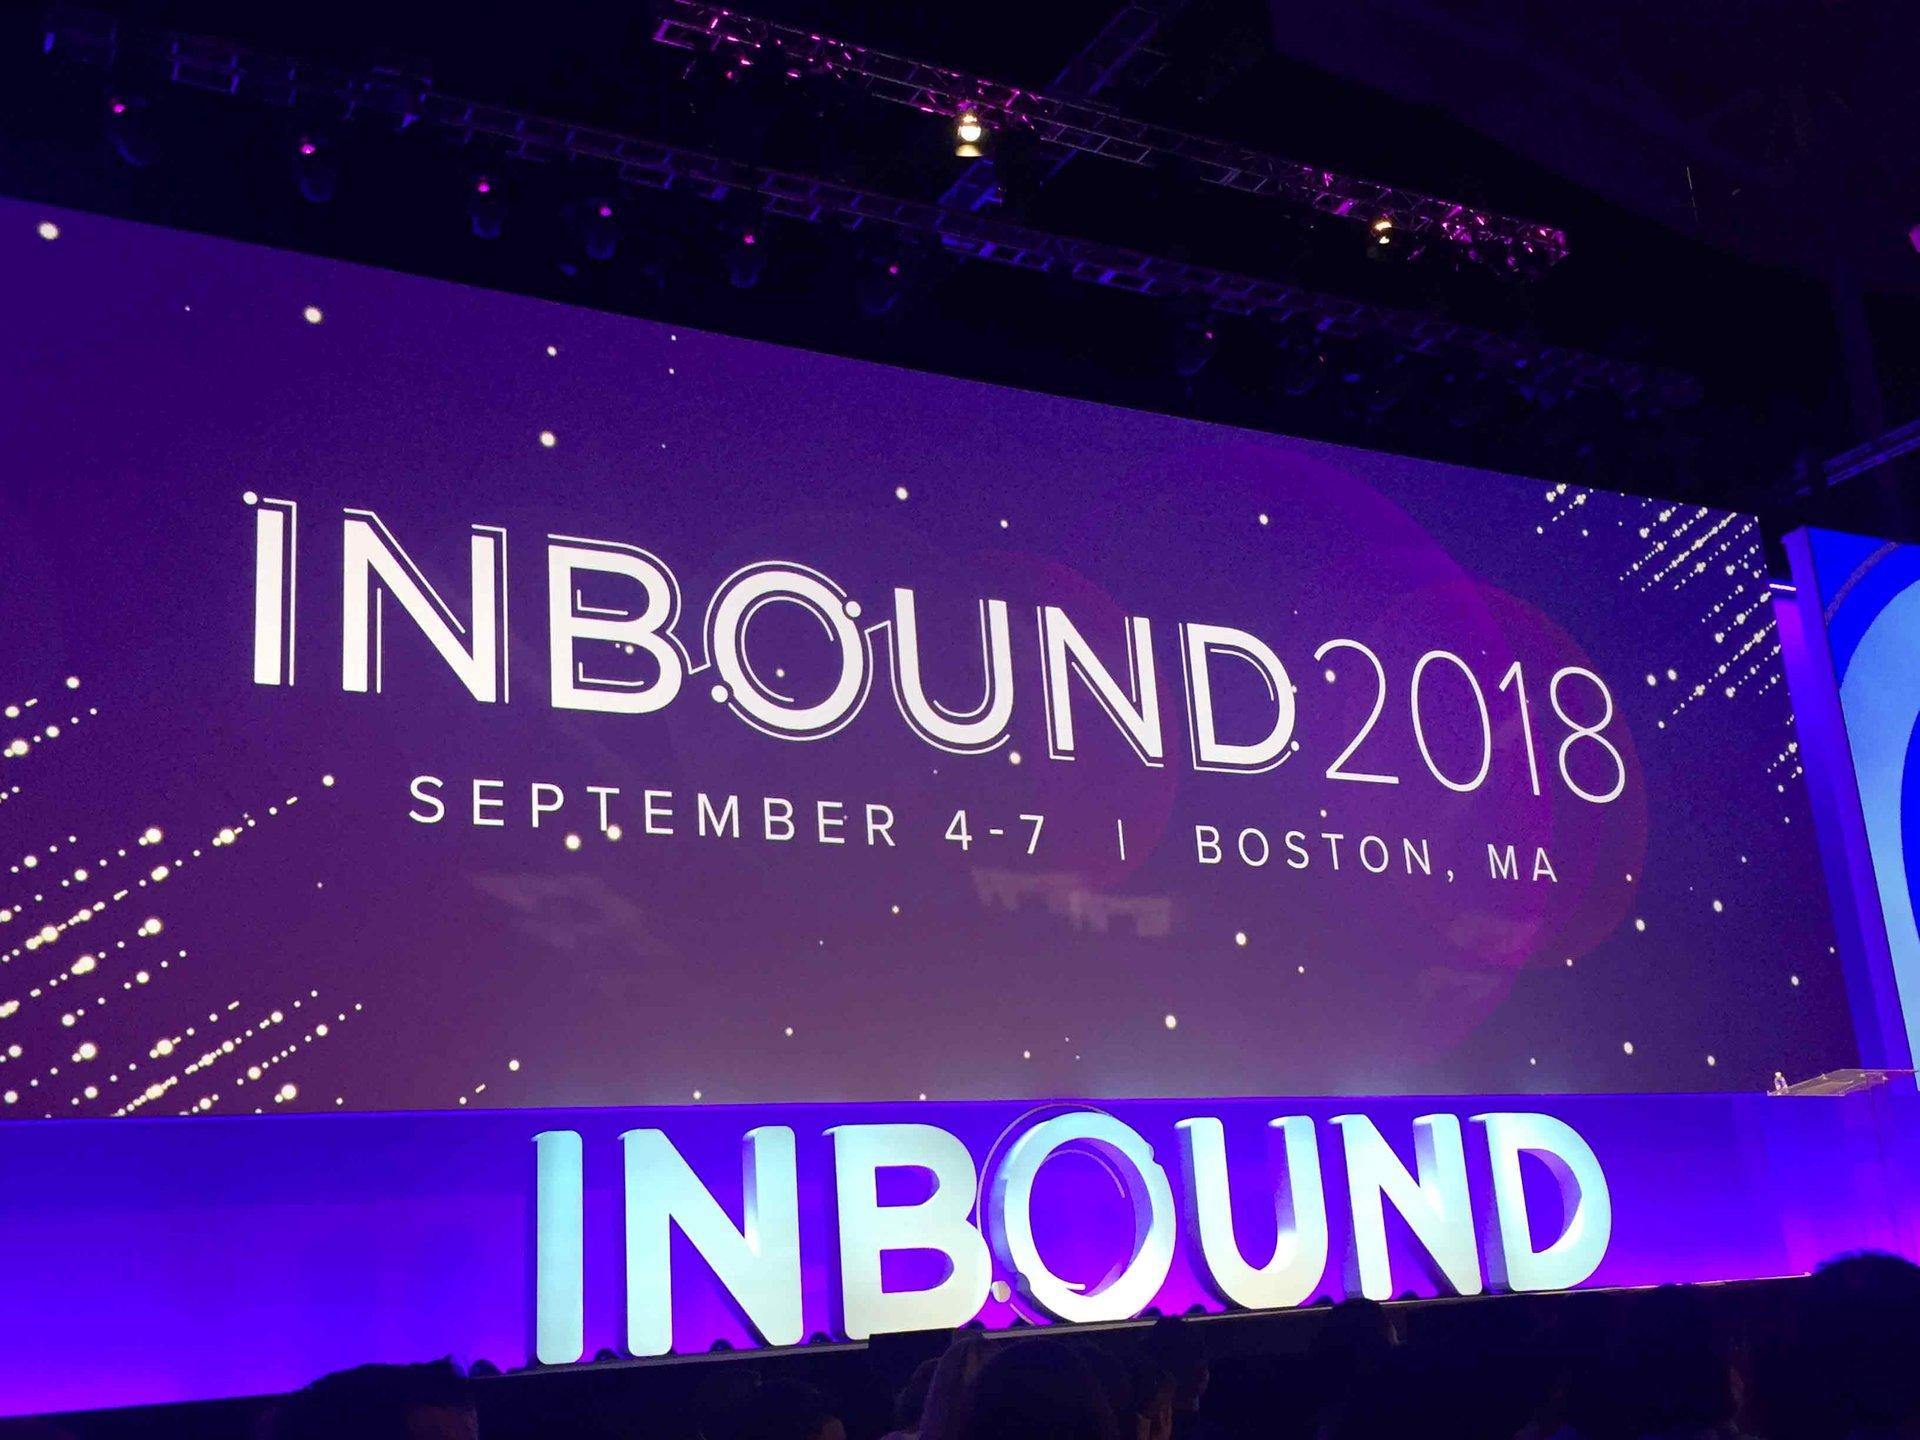 inbound-2018-conference-marketing-vente-boston